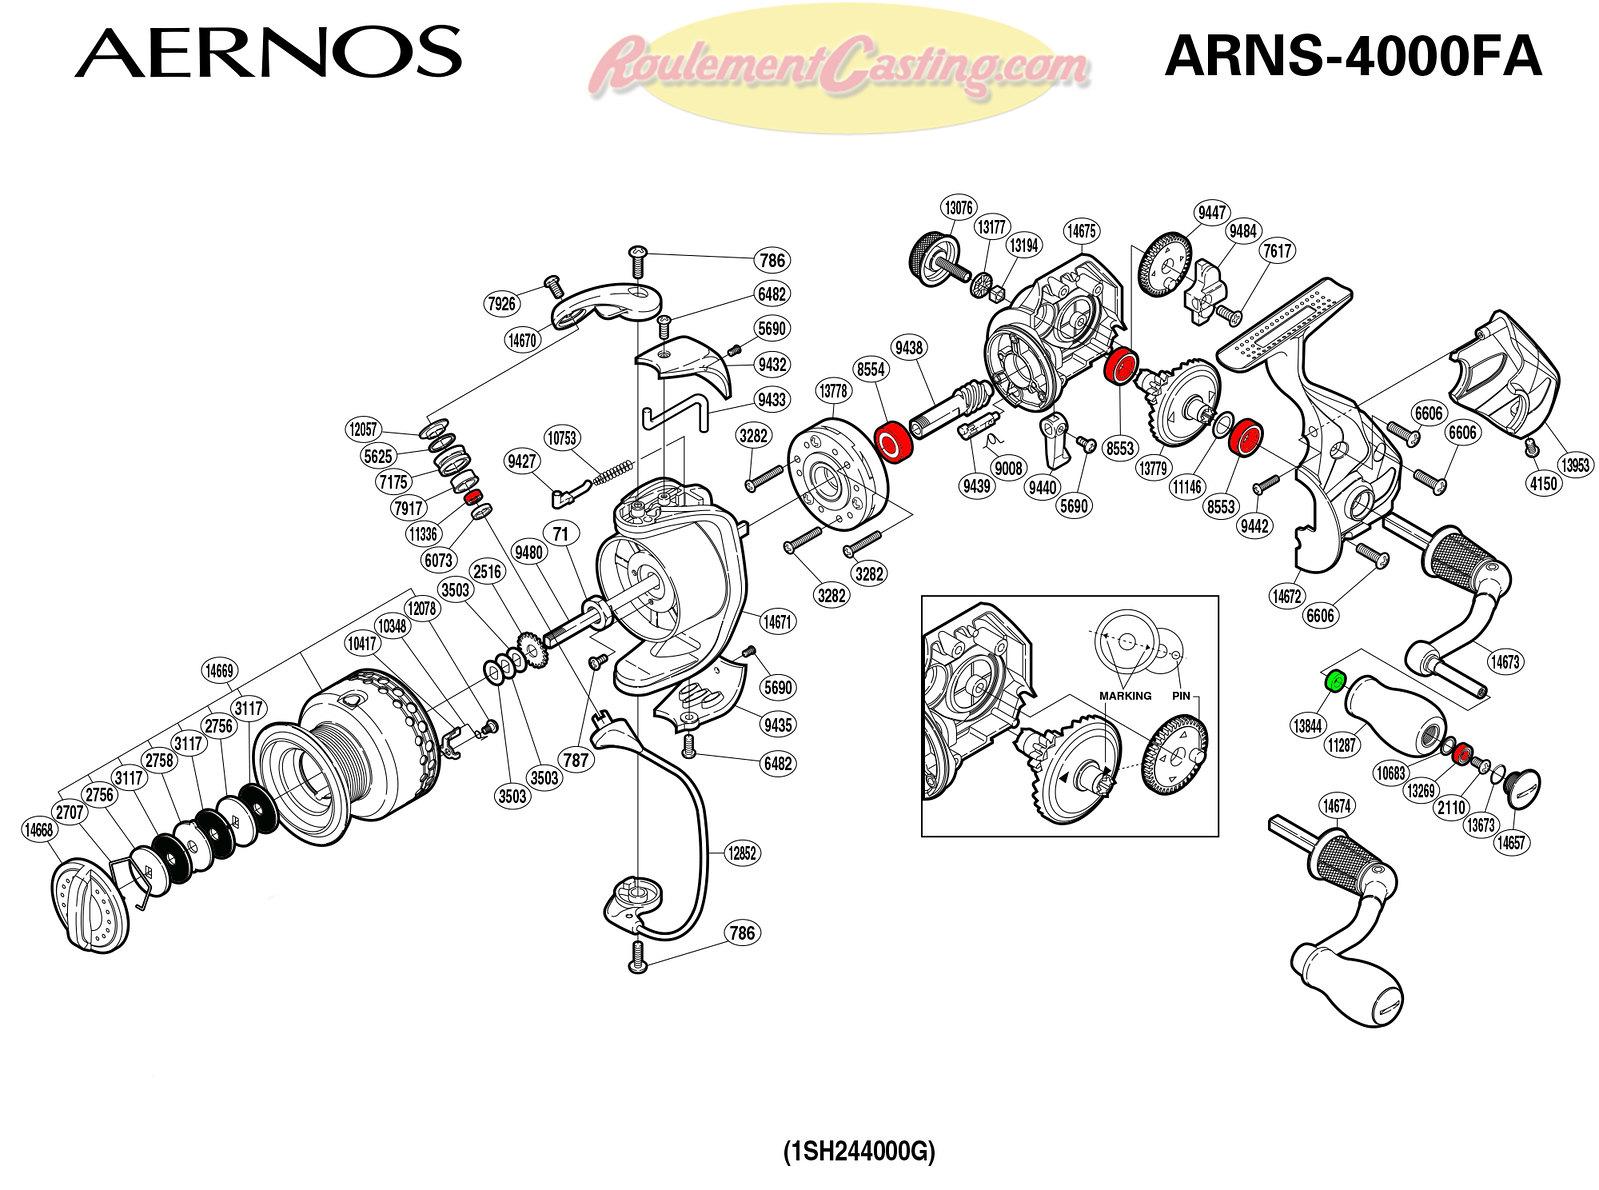 Schema-Shimano-AERNOS-4000FA